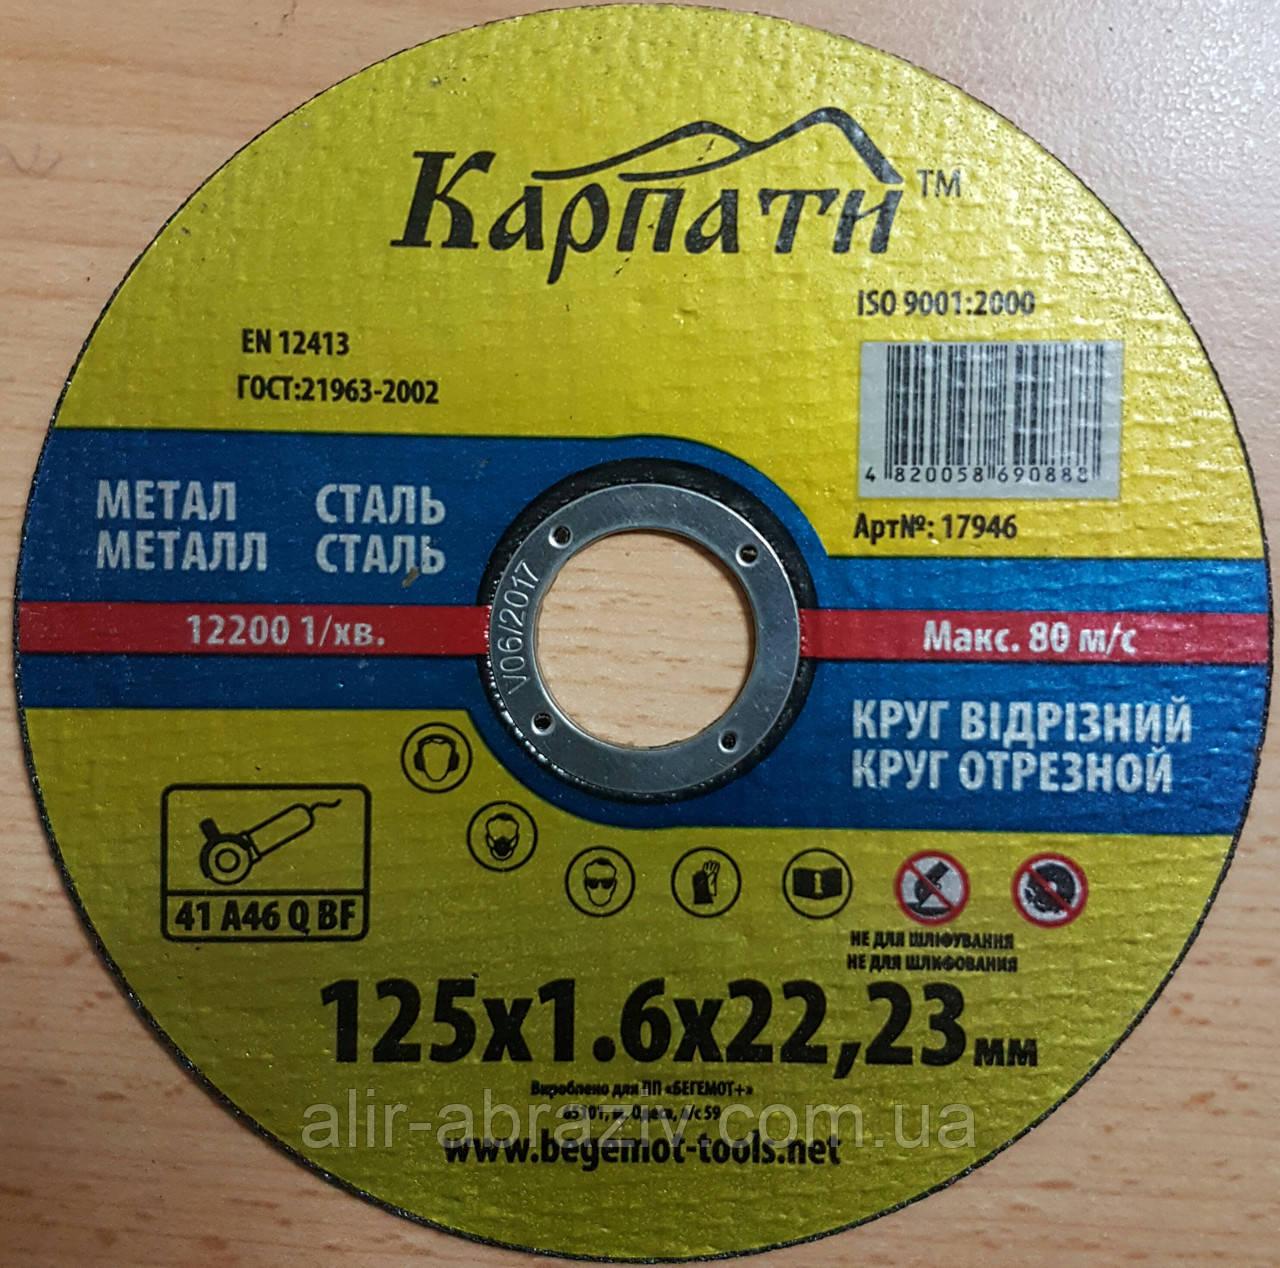 Круг отрезной по металлу 125 х 1,6 х 22 Карпаты